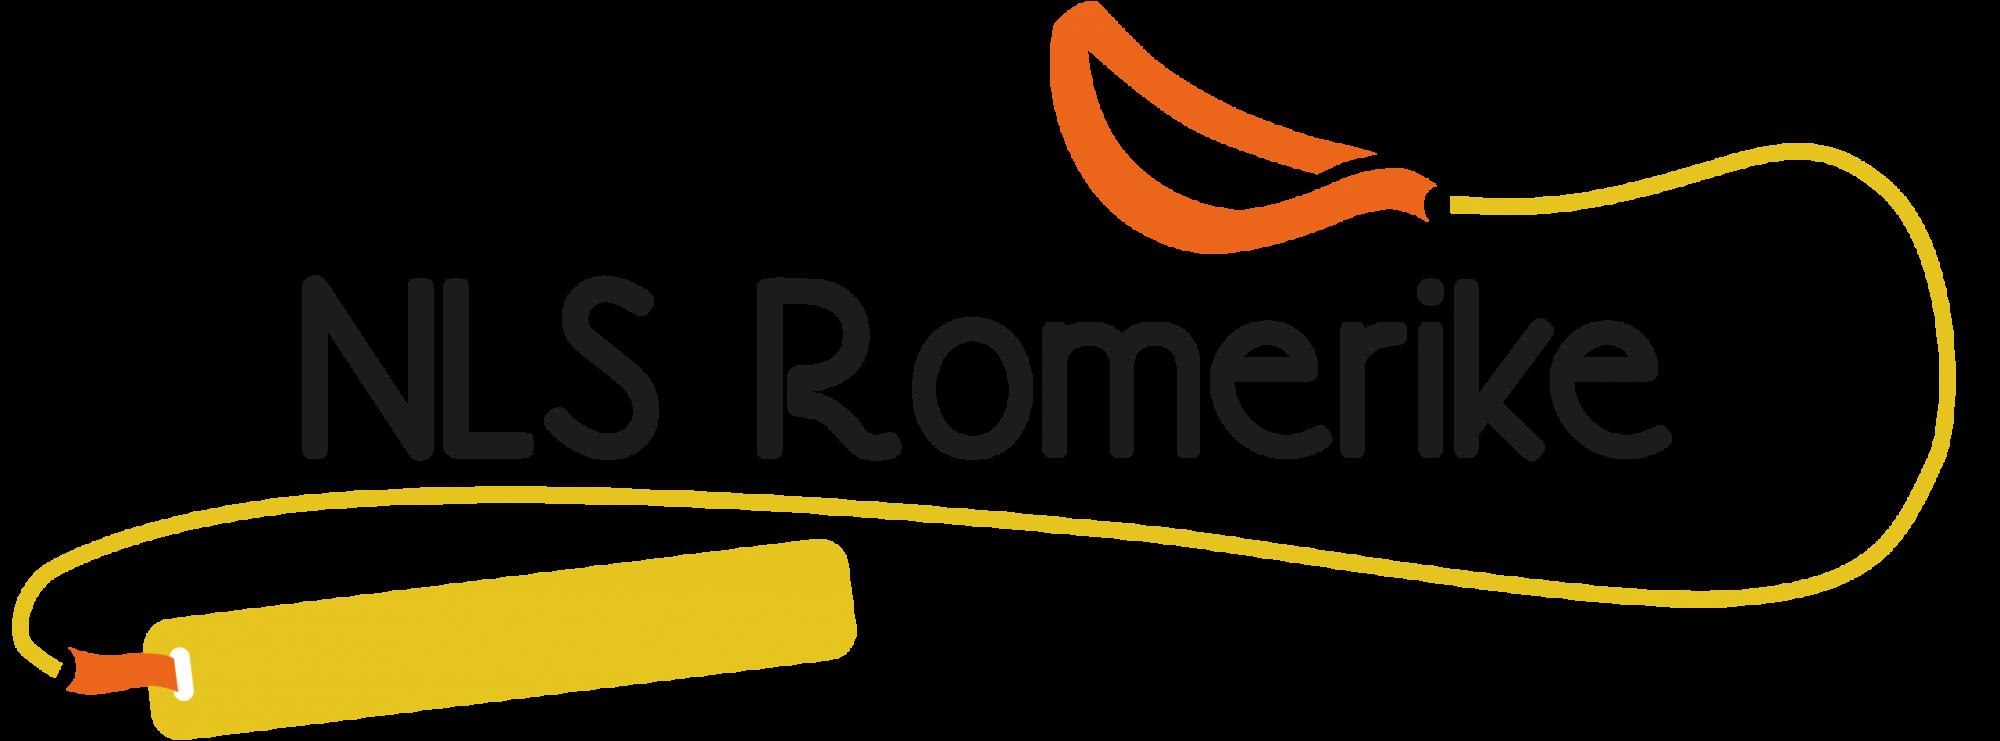 NLS Romerike krets